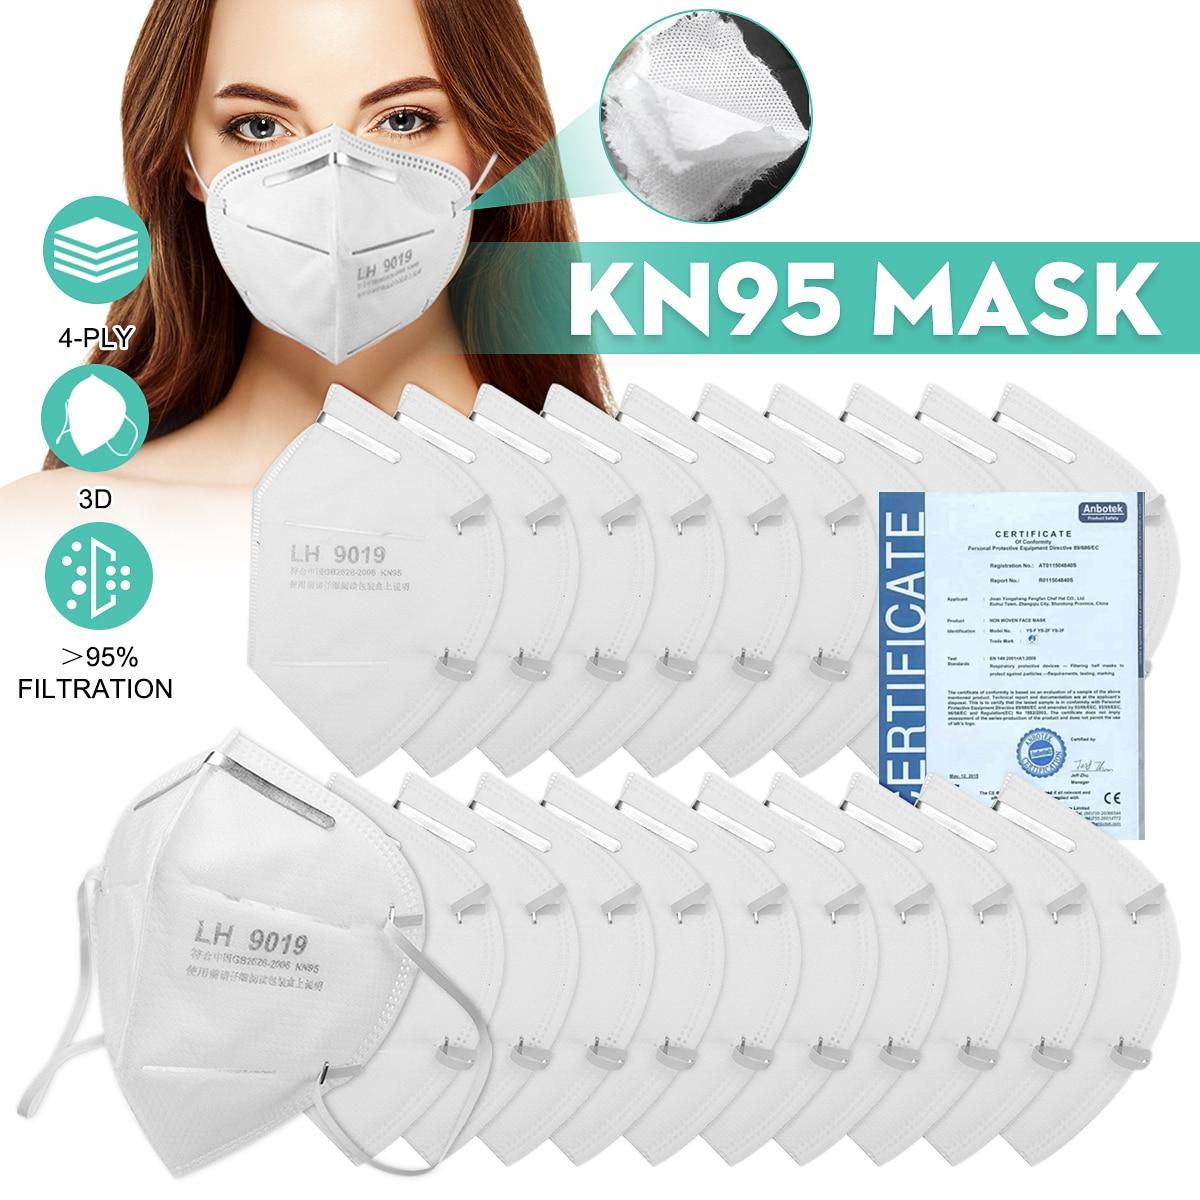 100PCS KN95 N95 FFP2 Mask PM2.5 Mouth Face Mask 95% Filtraion Cotton Mouth Masks Anti-Dust 4-layer Filtration Against Droplet